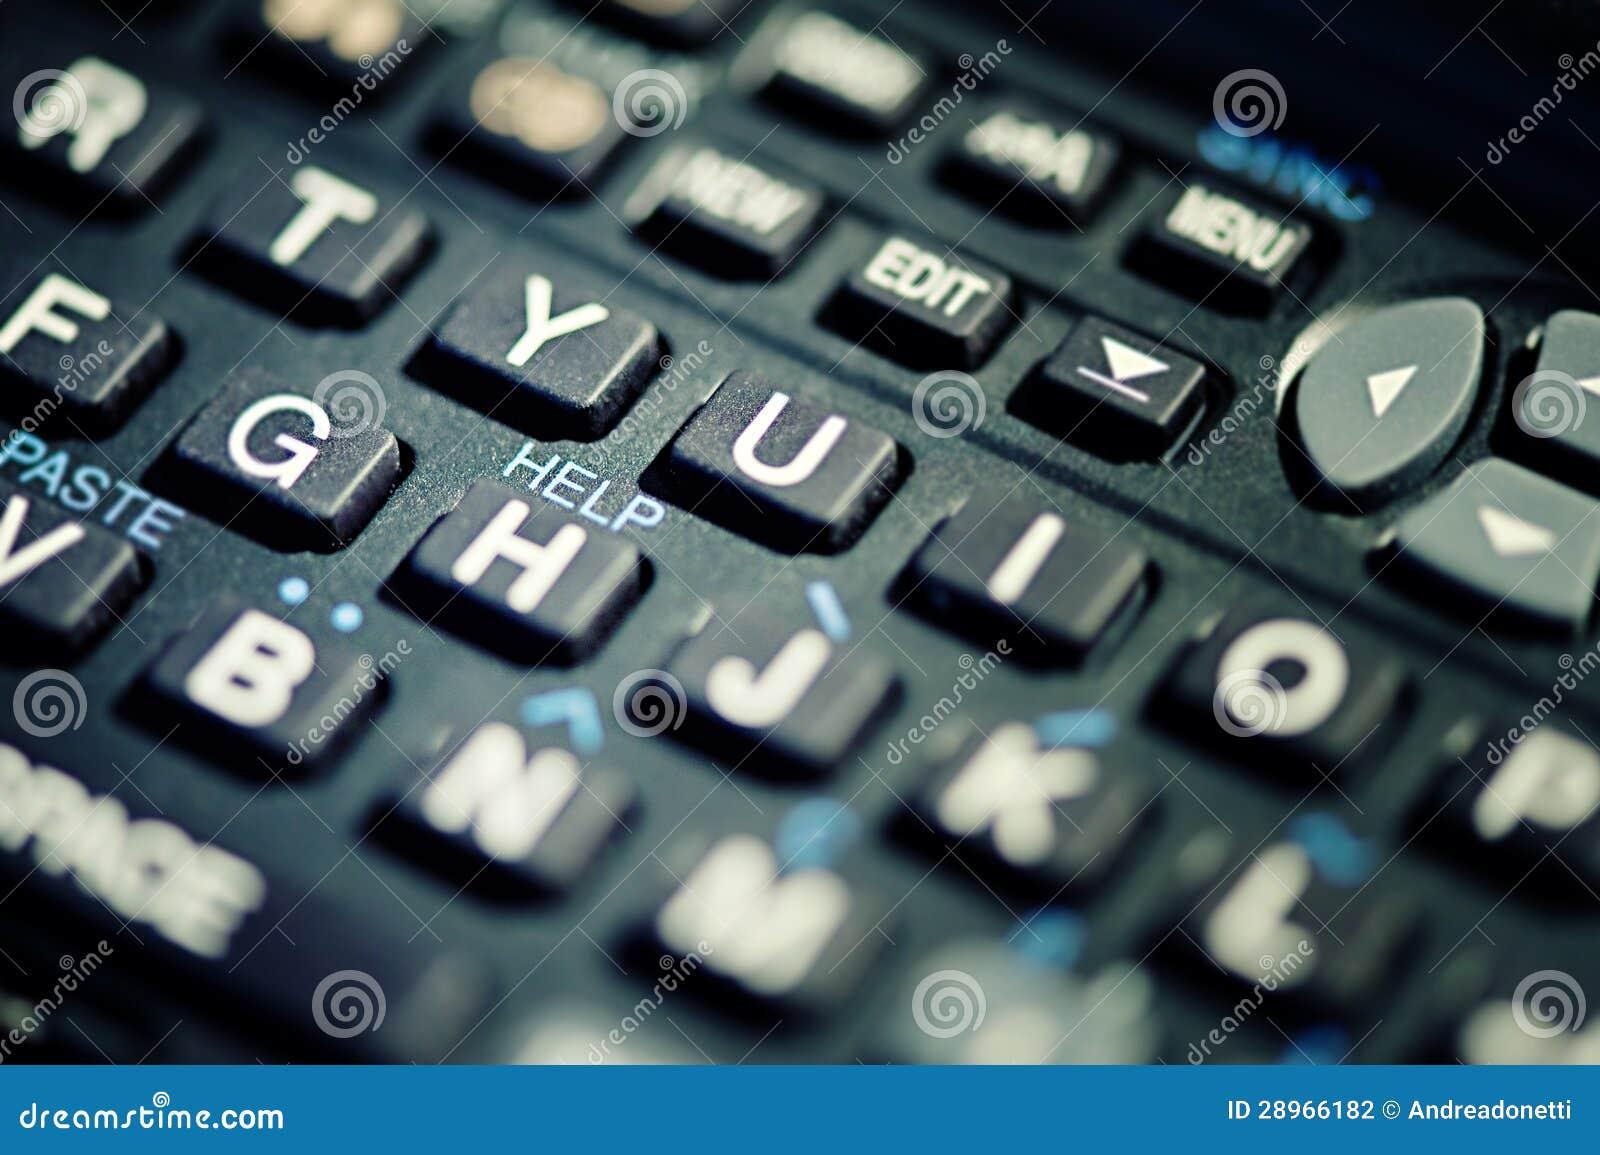 Pomoc tekst na klawiaturze